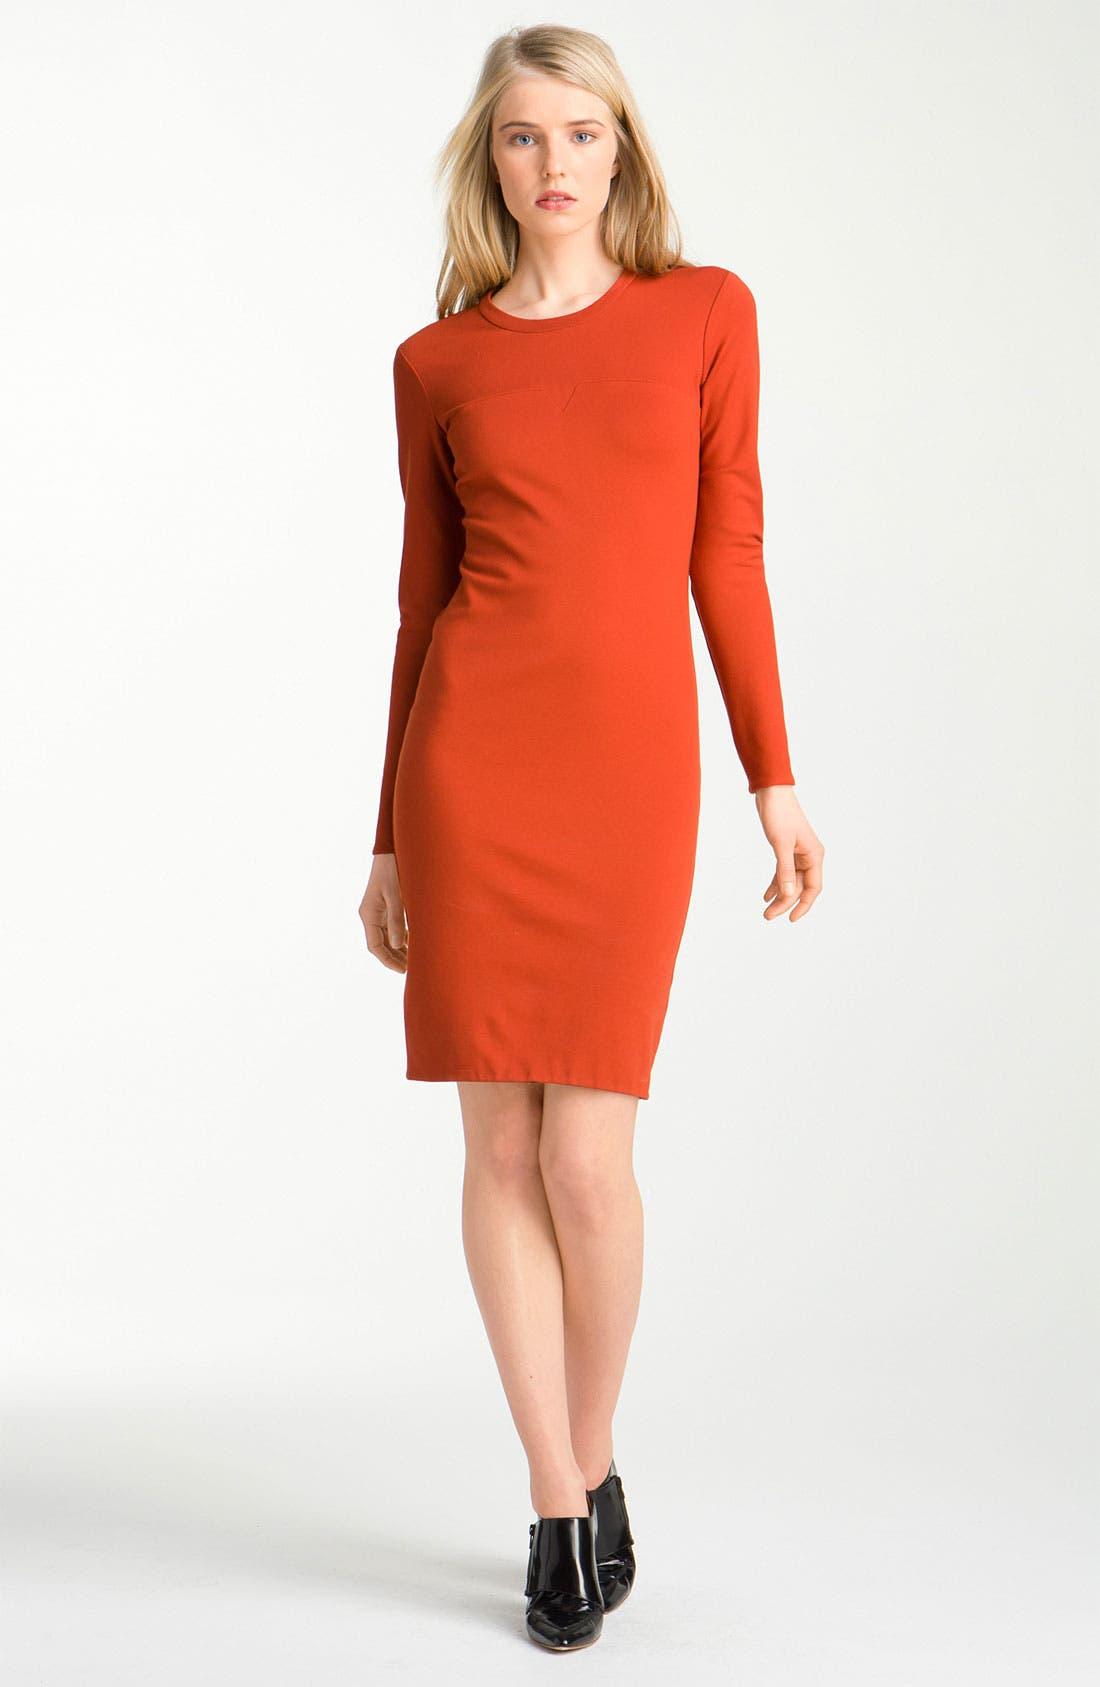 Main Image - 3.1 Phillip Lim Jersey Dress